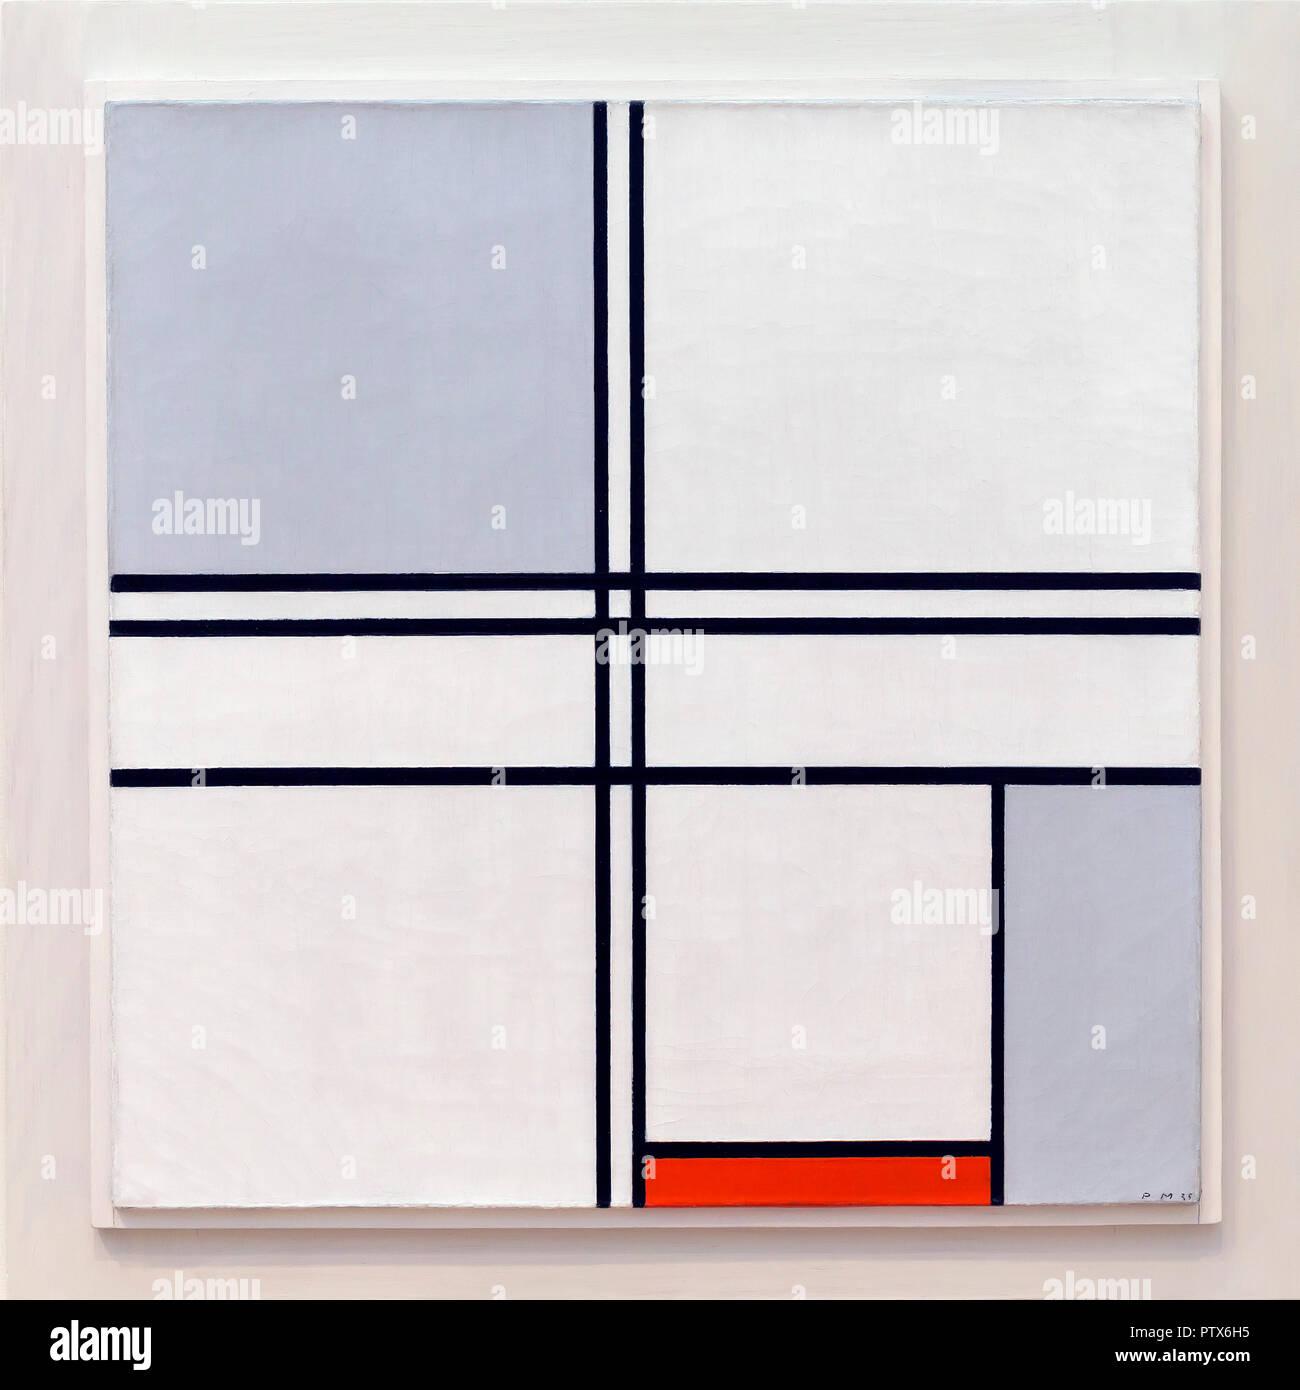 Composition No 1, Gray-Red, Piet Mondrian, 1935, Art Institute of Chicago, Chicago, Illinois, USA, Amérique du Nord Photo Stock